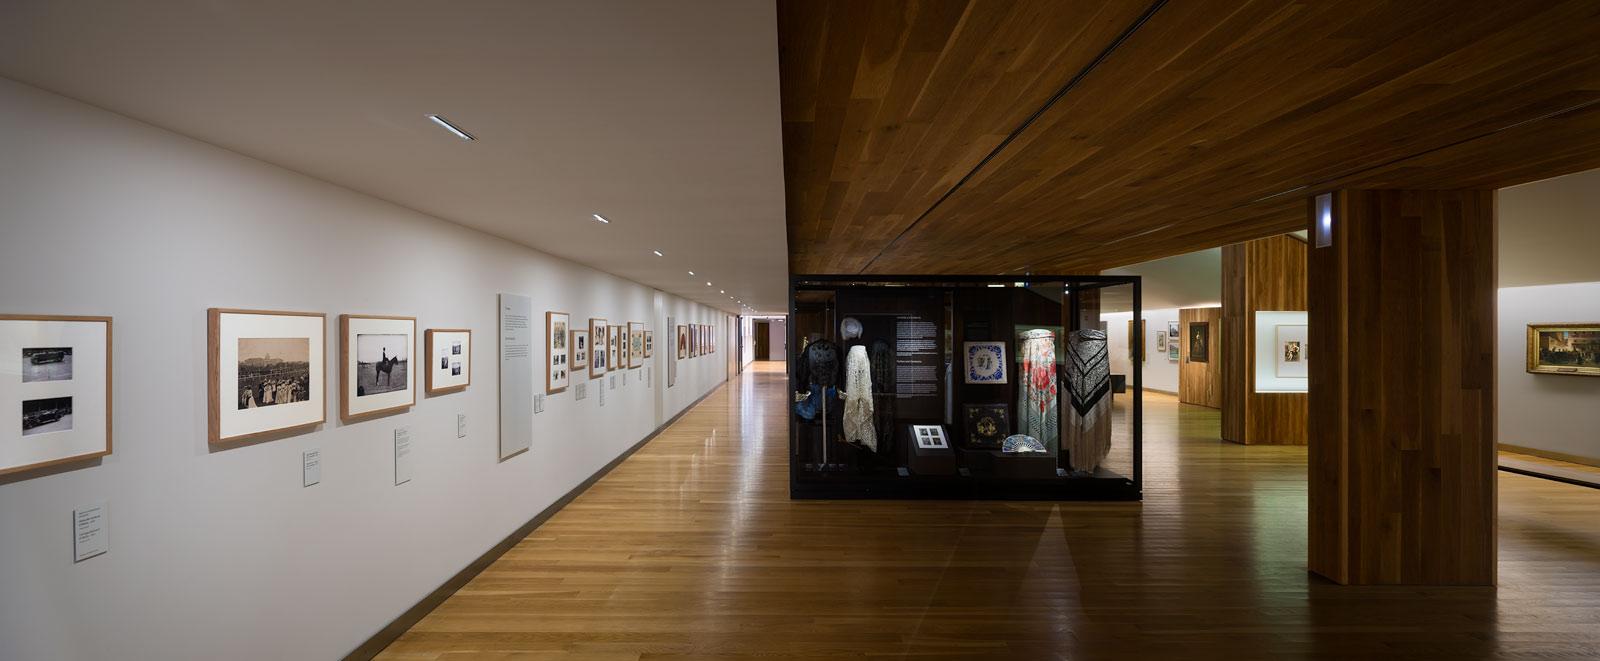 Museo de Historia de Madrid · Ypuntoending · 015.jpg